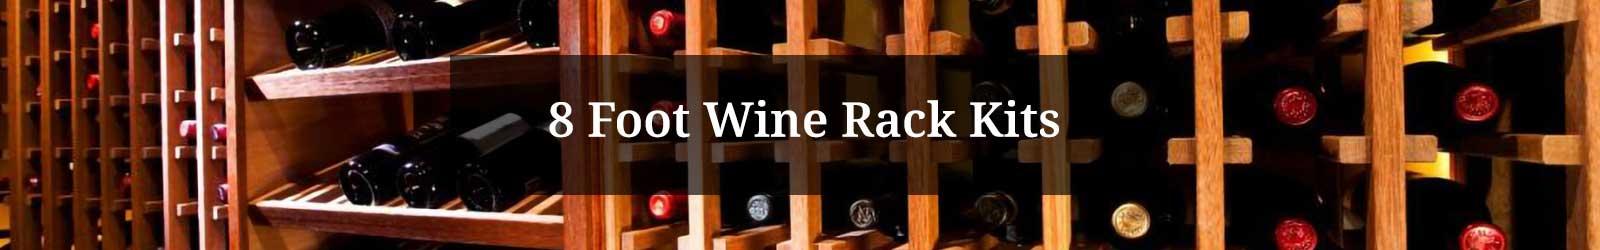 8 Foot Wine Rack Kits